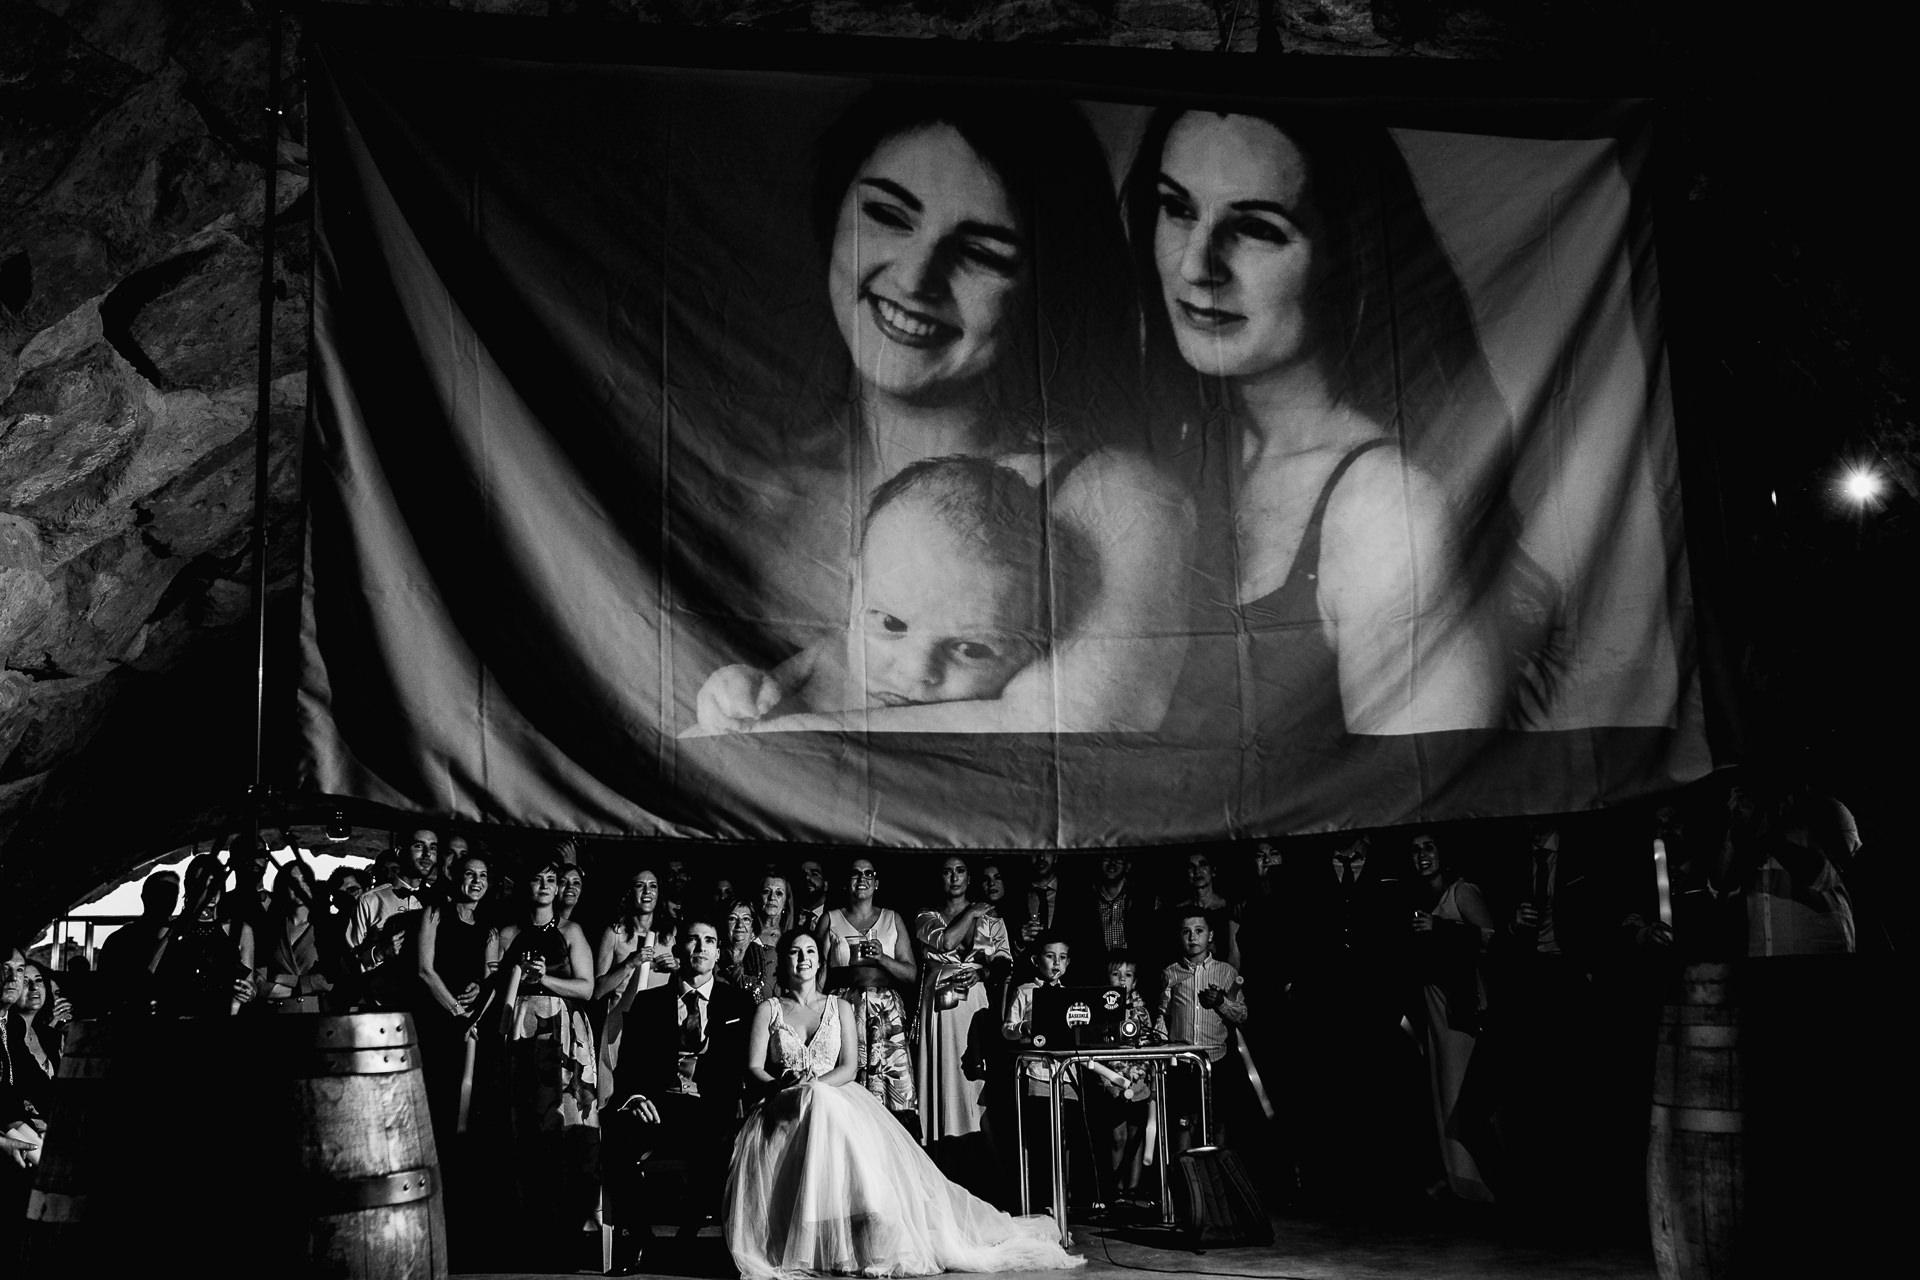 boda civil eguren ugarte larioja 194629